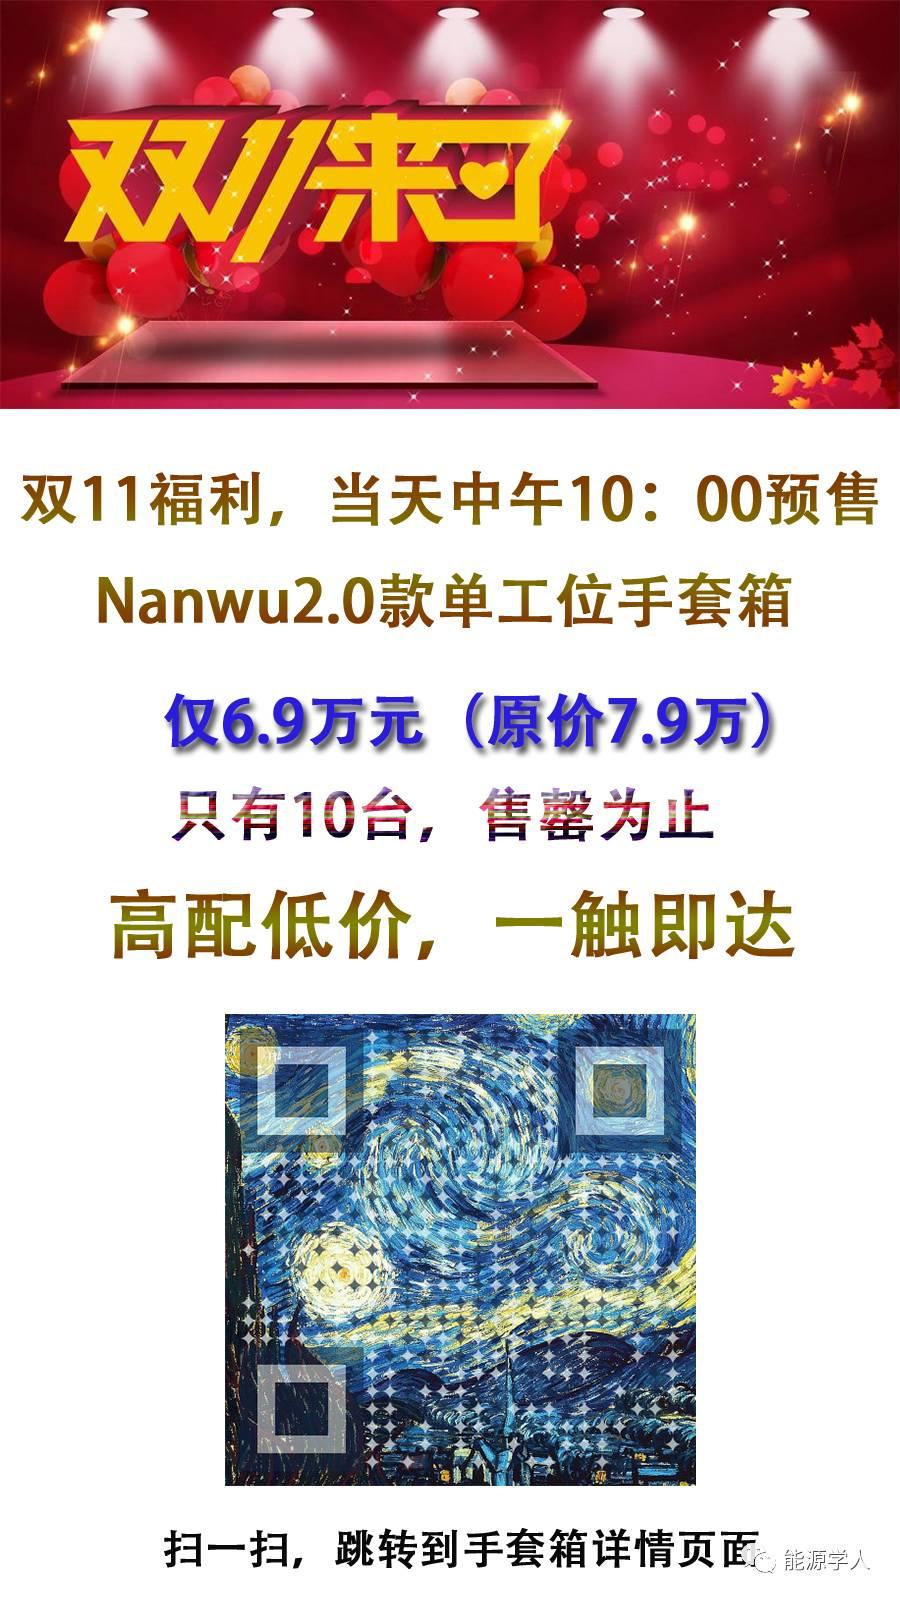 Nanwu2.0|纯净之美,触动我芯